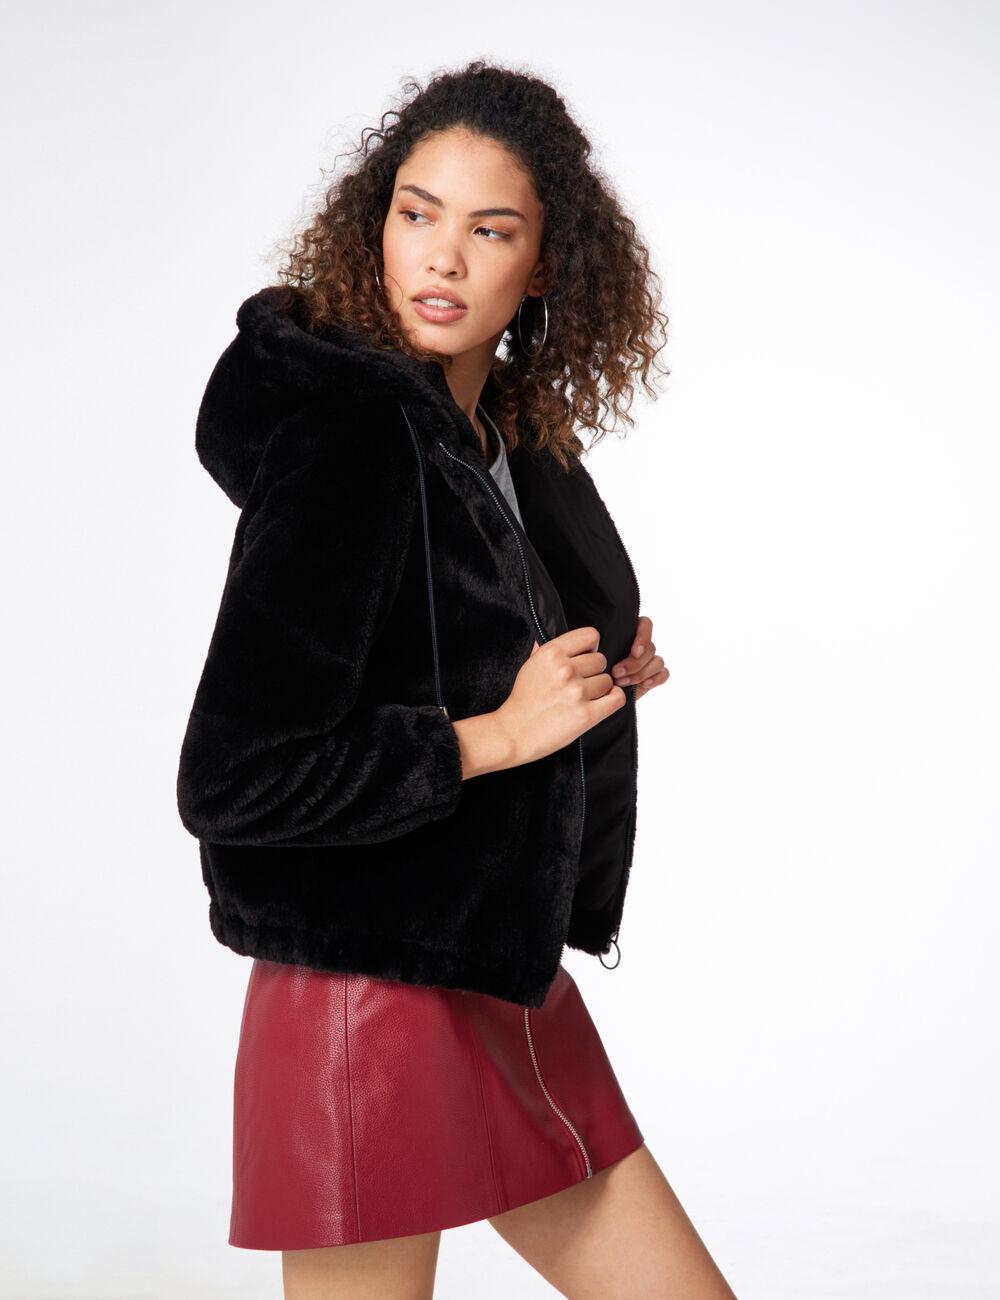 Manteau Imitation Fourrure Noir Femme Jennyfer